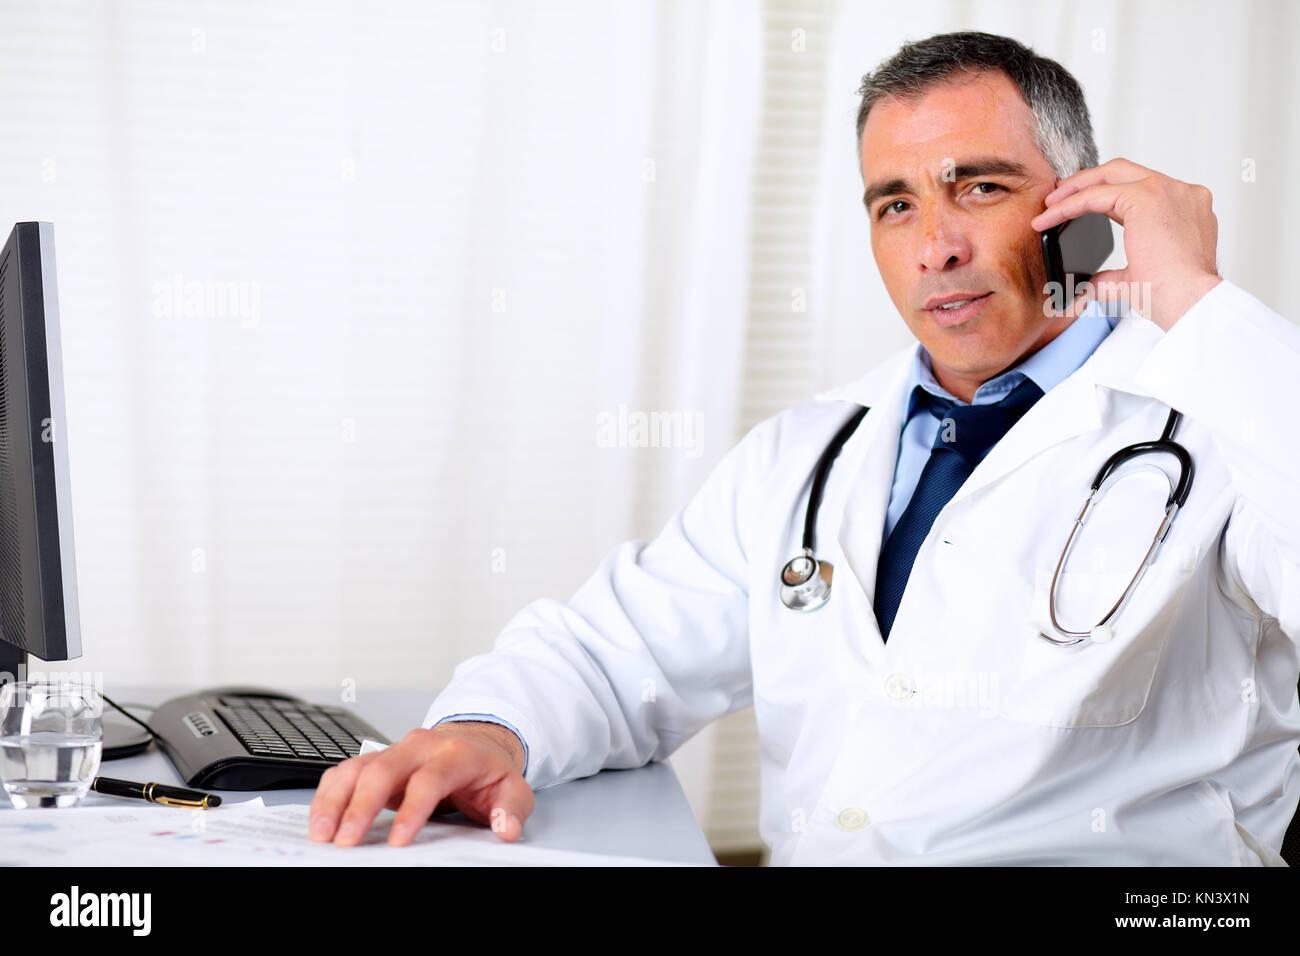 Retrato de un profesional amable médico superior utilizando un teléfono móvil. Imagen De Stock